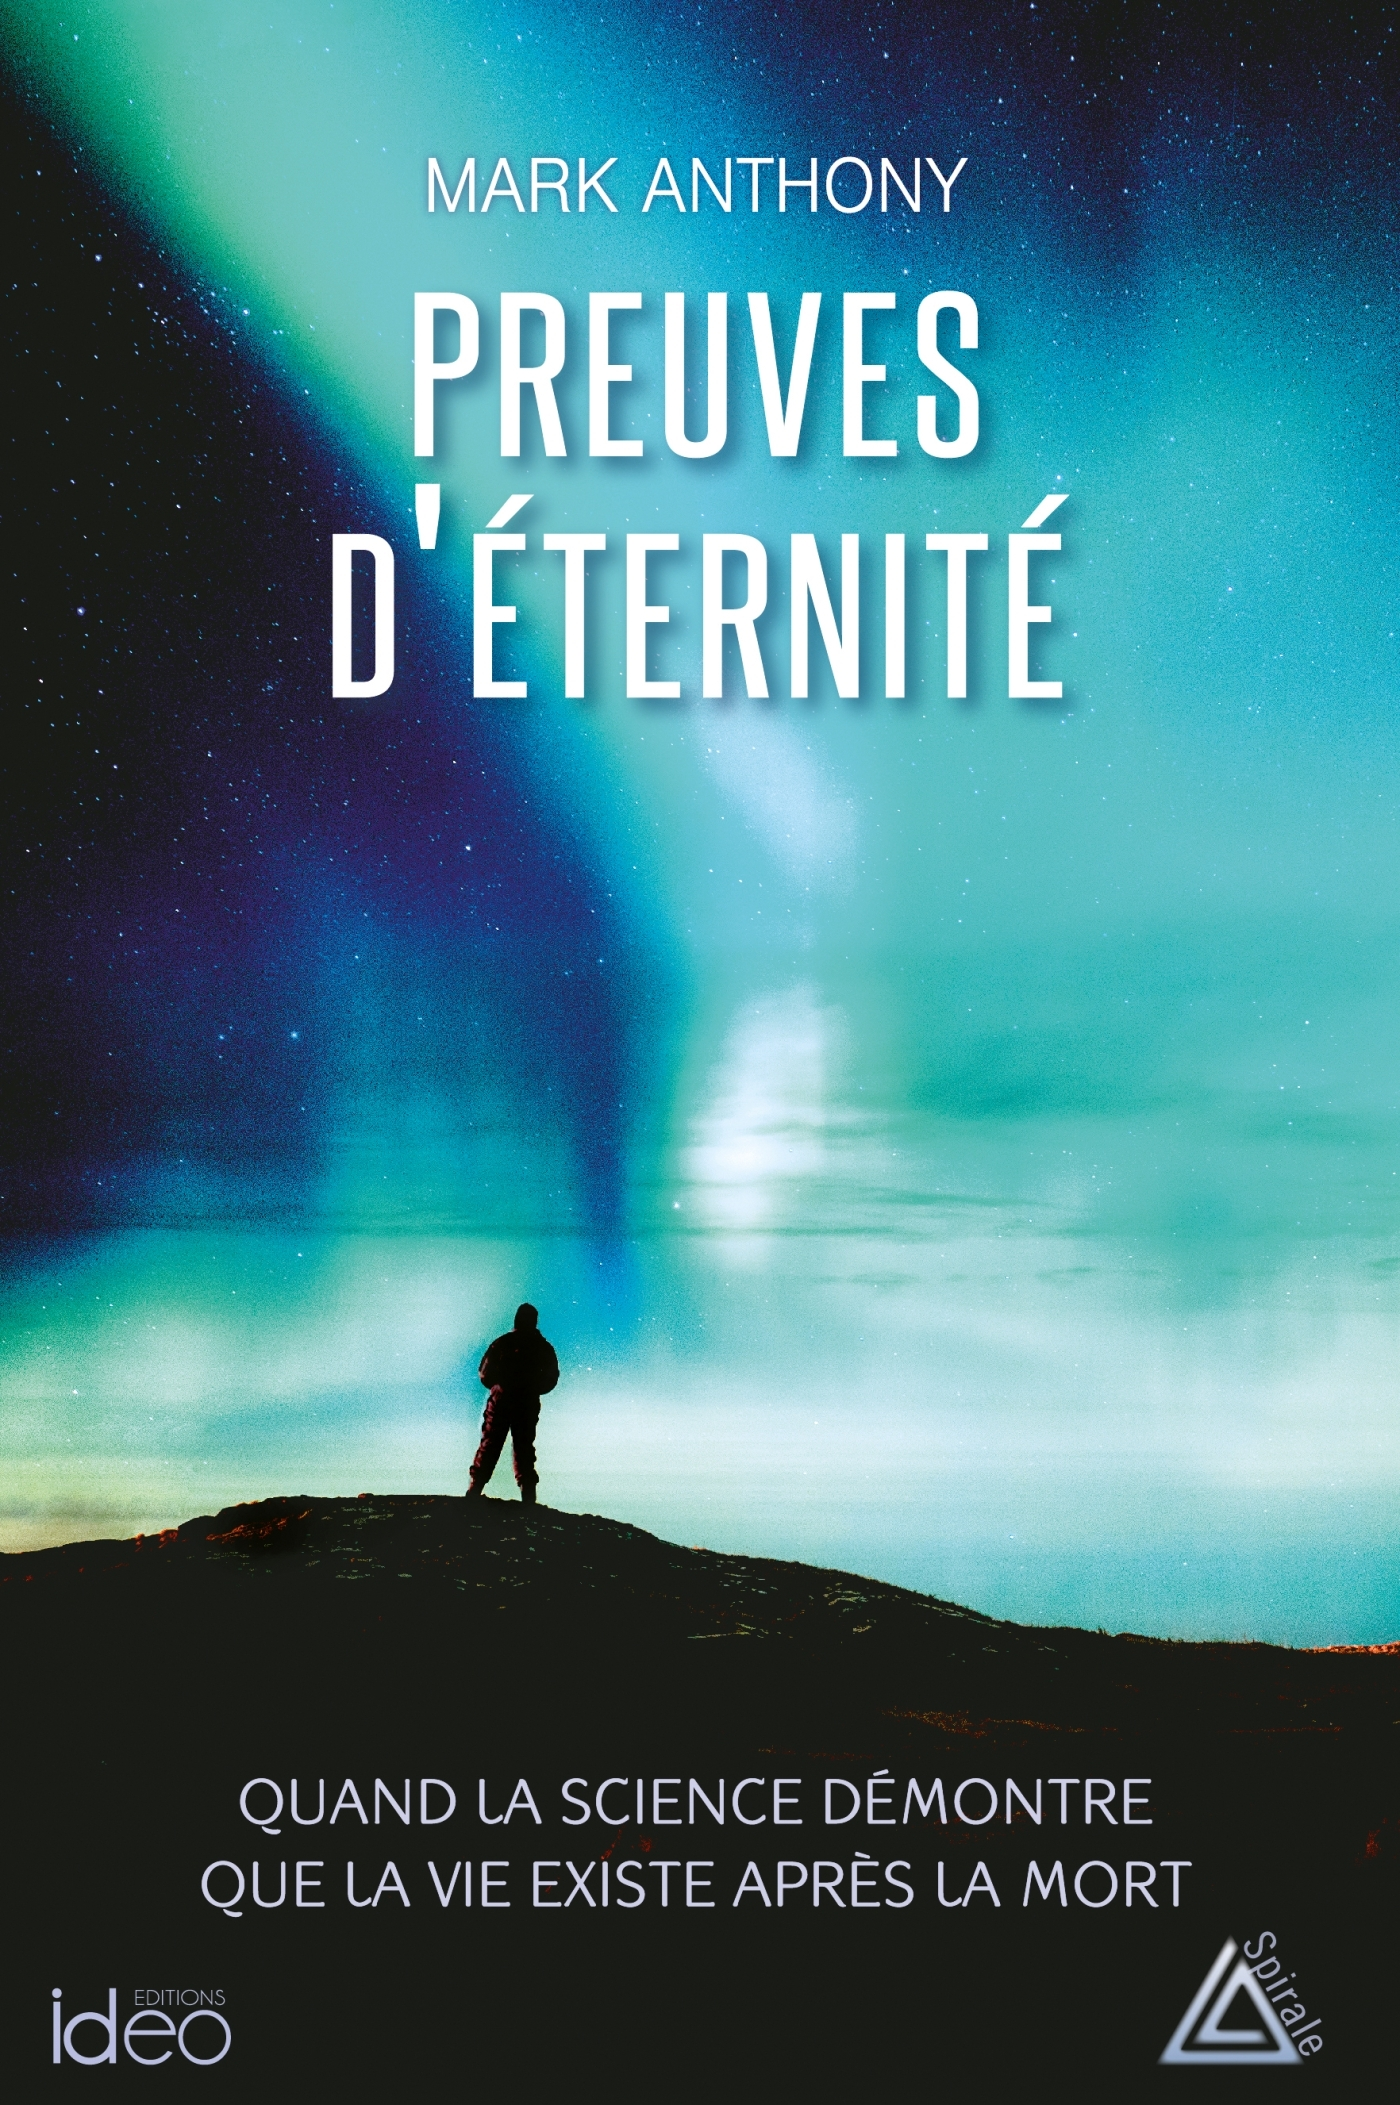 PREUVES D'ETERNITE